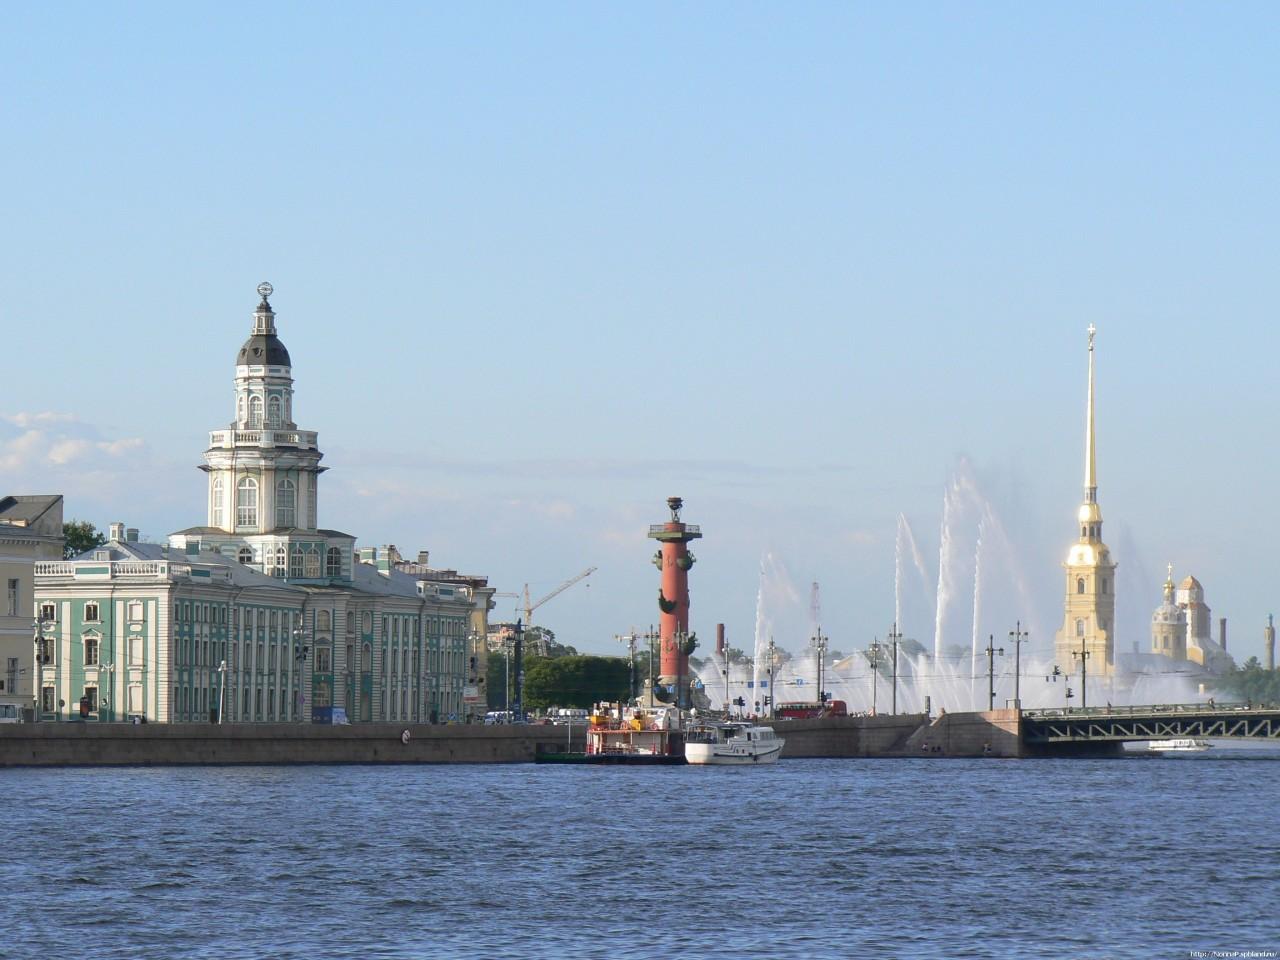 http://foto.spbland.ru/data/media/1/lrg_118489_P1000510.JPG